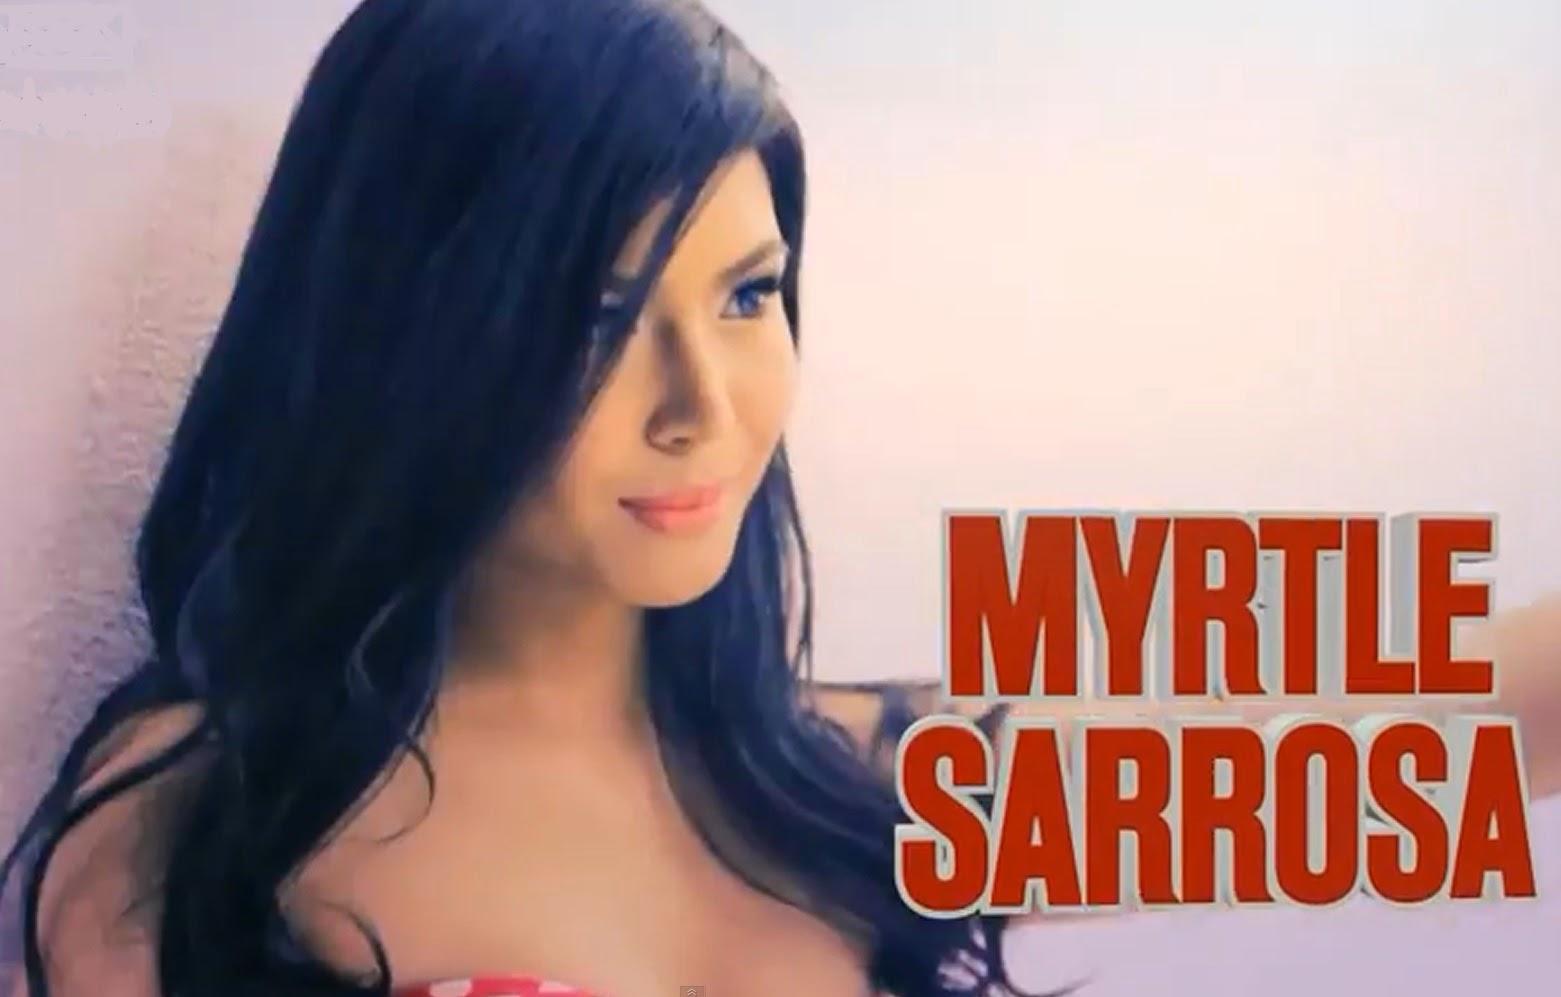 MYRTLE SARROSA 5